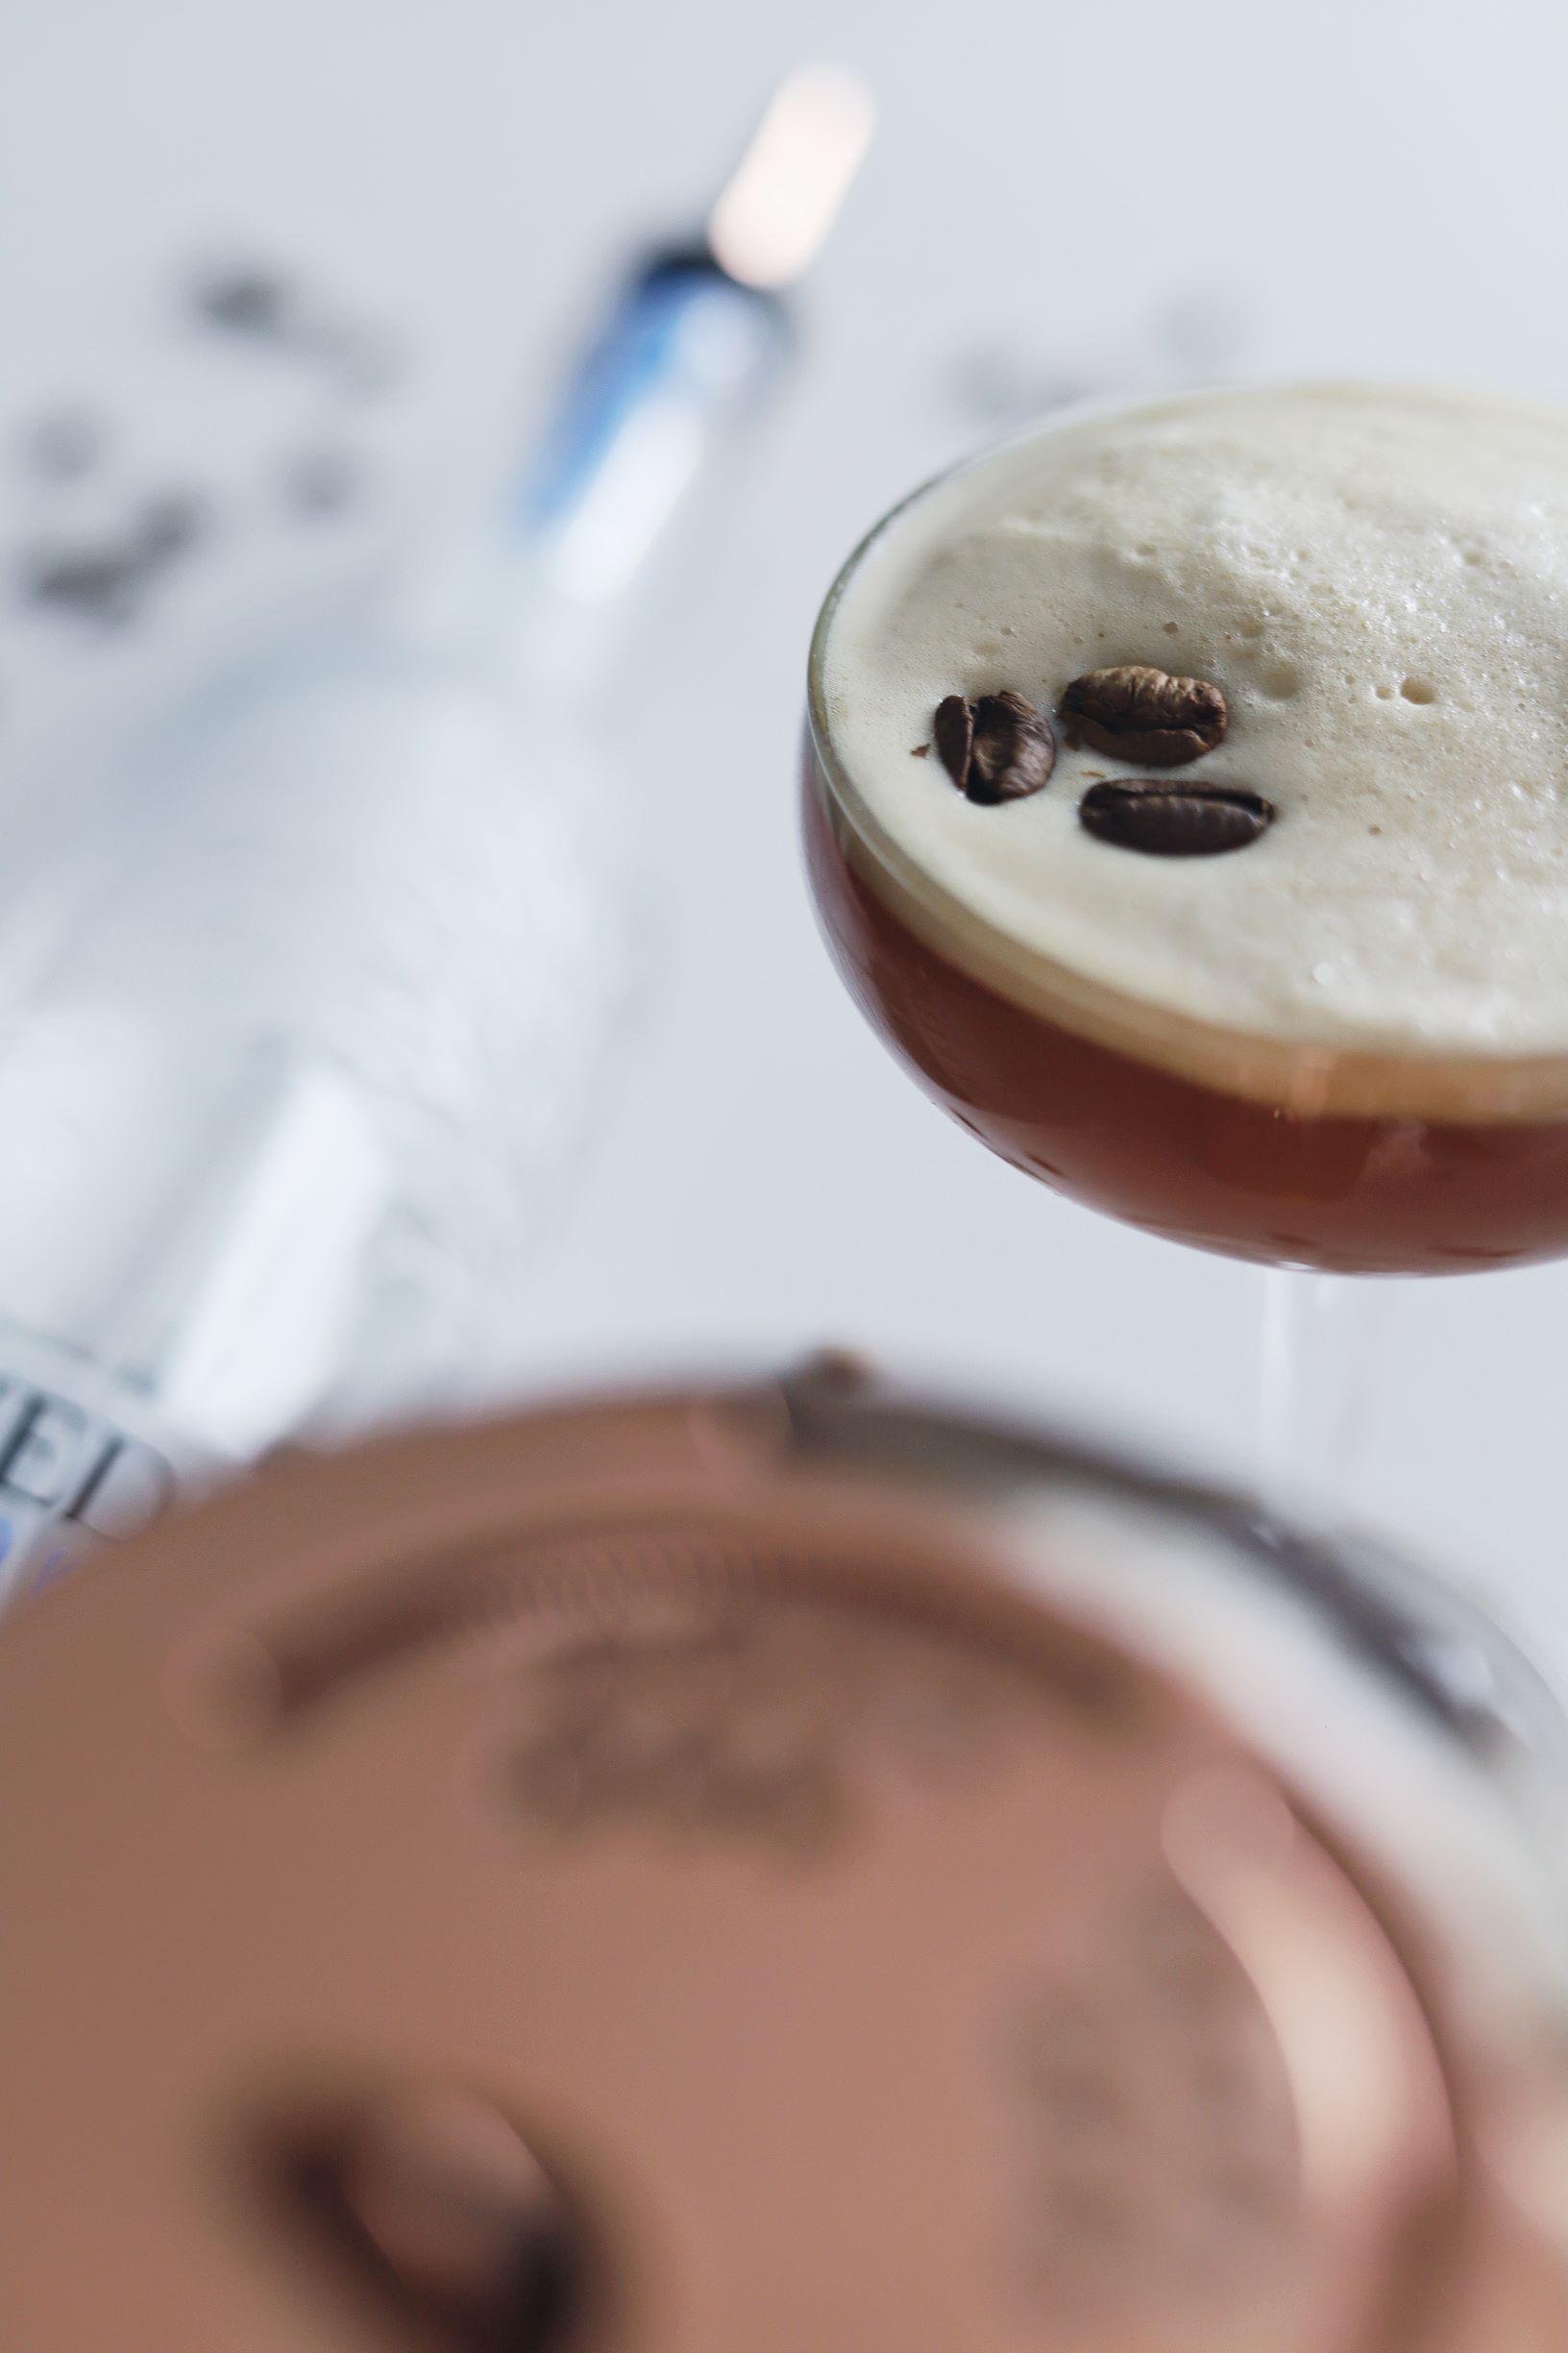 LeClair Organics Liberica Coffee, best espresso martini recipes, belvedere polish vodka, coffee cocktail recipes 9